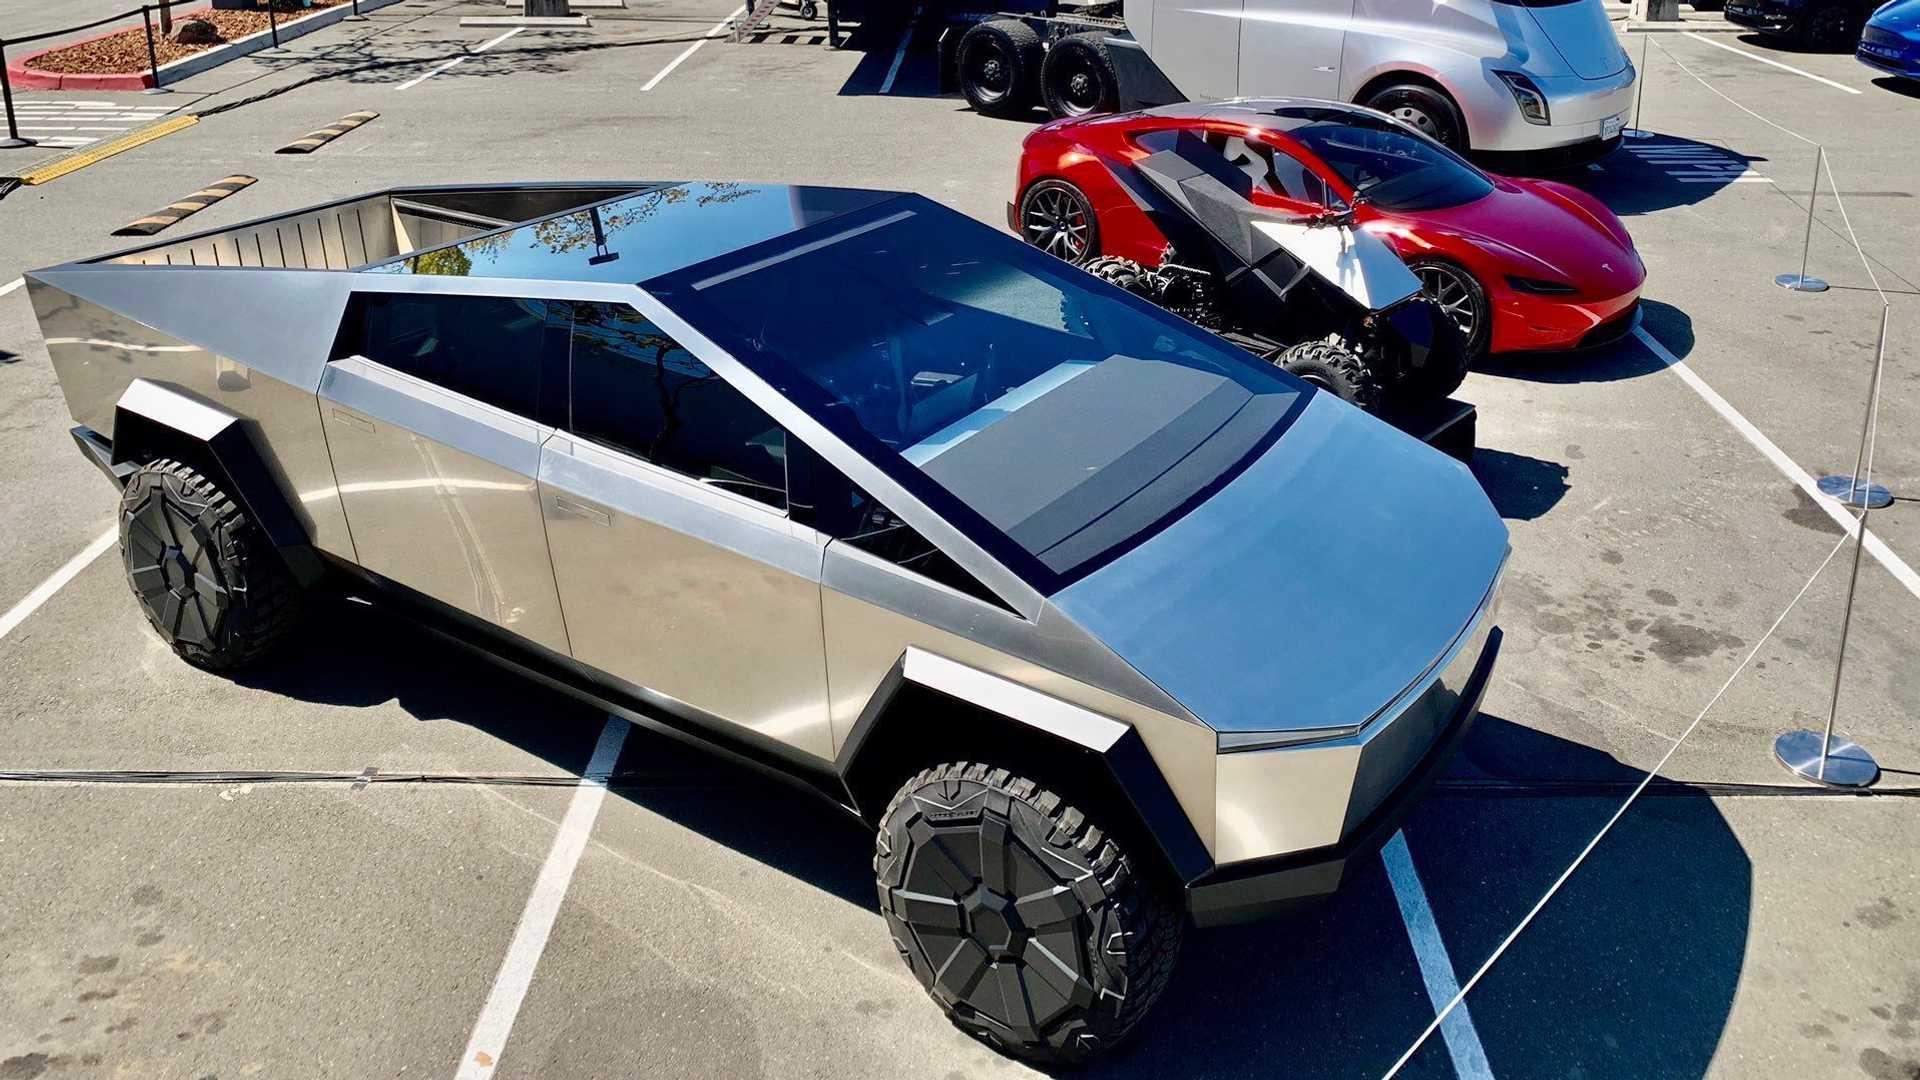 Elon Musk bevestigt achterwielbesturing in Tesla Cybertruck